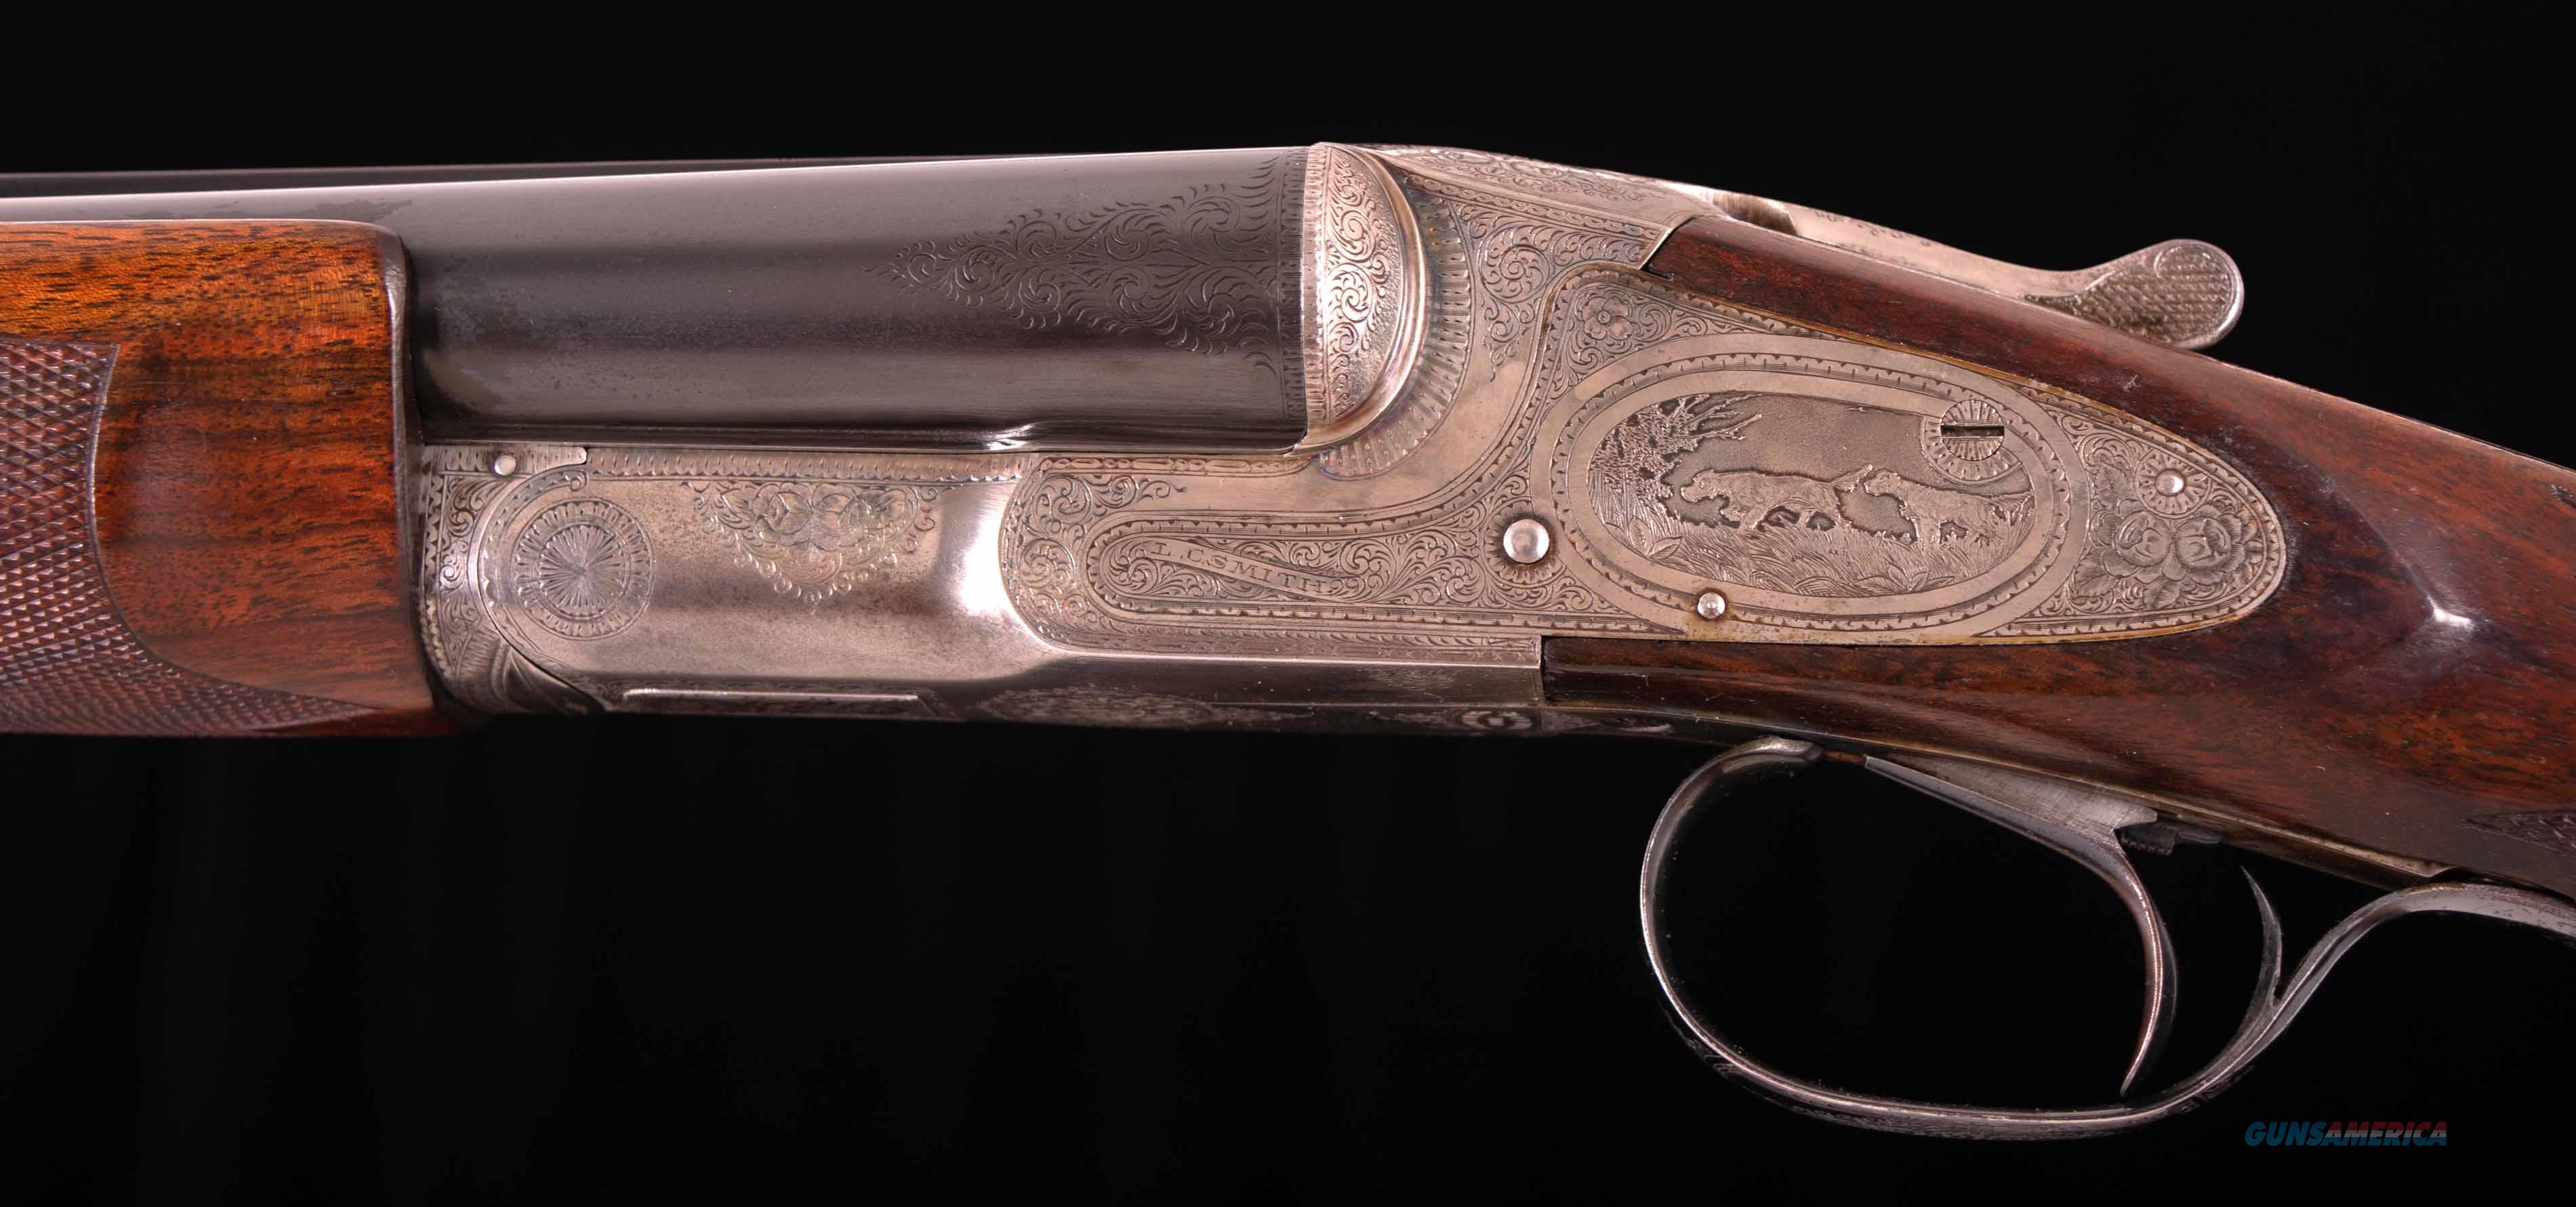 L.C. Smith Crown 12 Gauge – PROVENANCE, VENT RIB, vintage firearms inc  Guns > Shotguns > L.C. Smith Shotguns